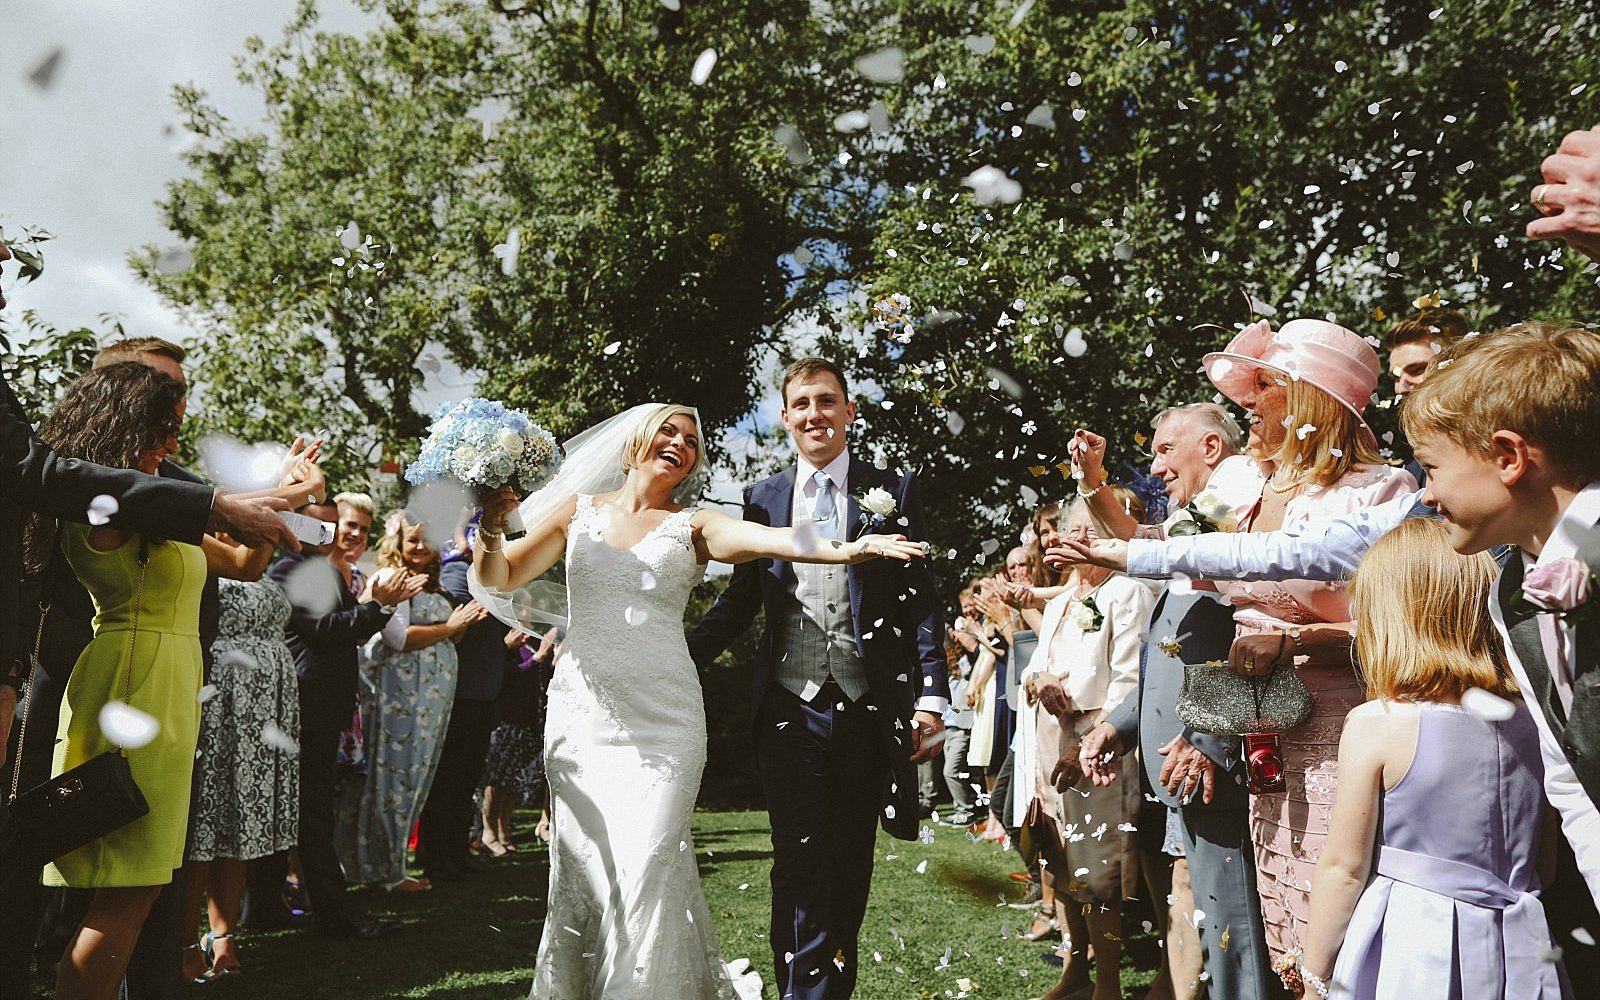 Ribby-Hall-Village-Weddings-Wedding-embee-Photographer-Photography-Lancashire0120